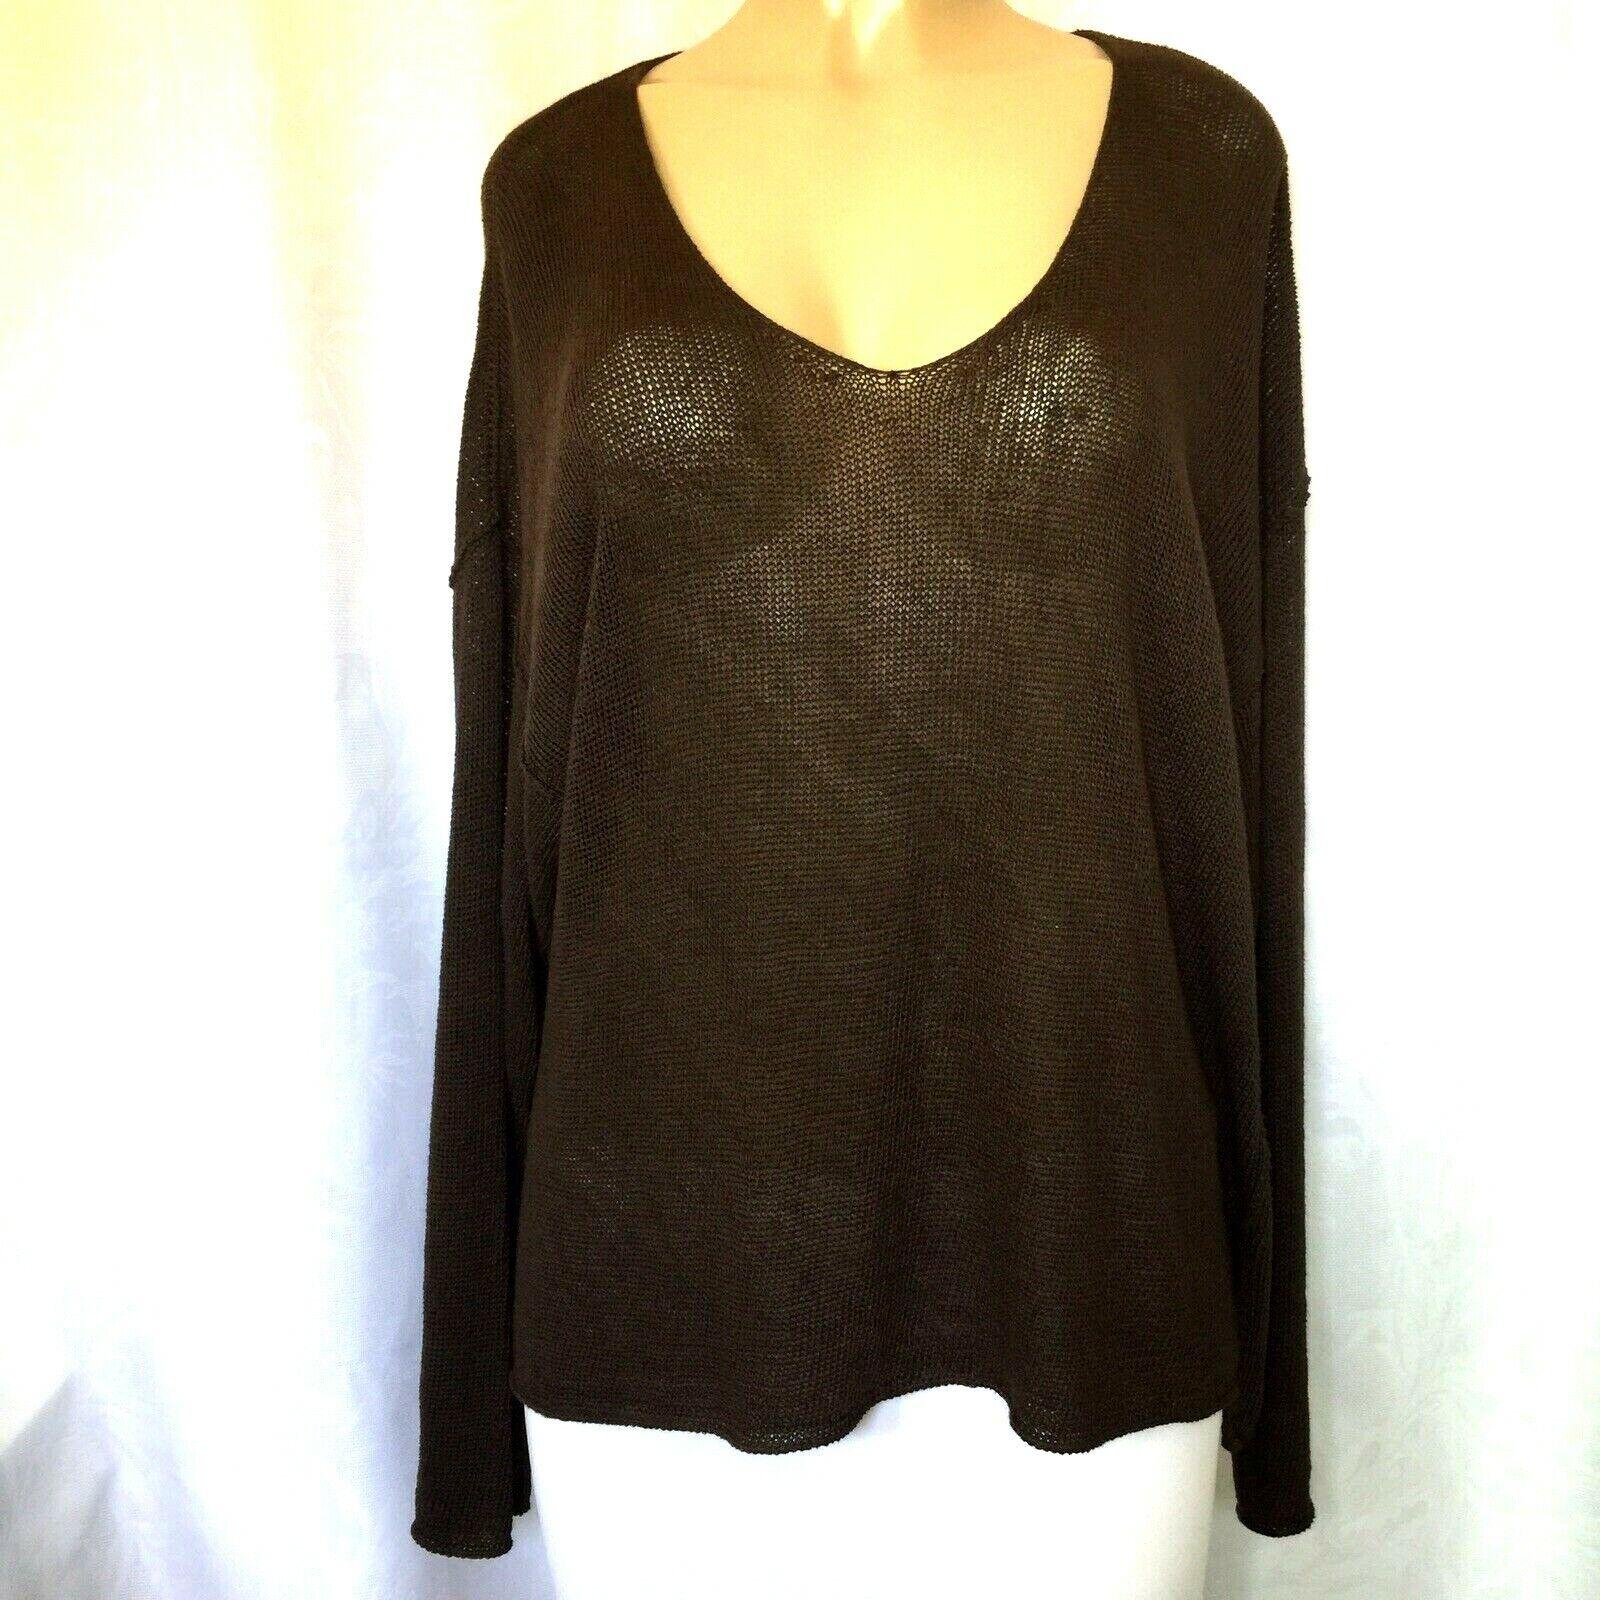 MARIA DI RIPAWeiß Top Sweater Linen Shirt Knit braun Long Sleeve V Neck 12 L